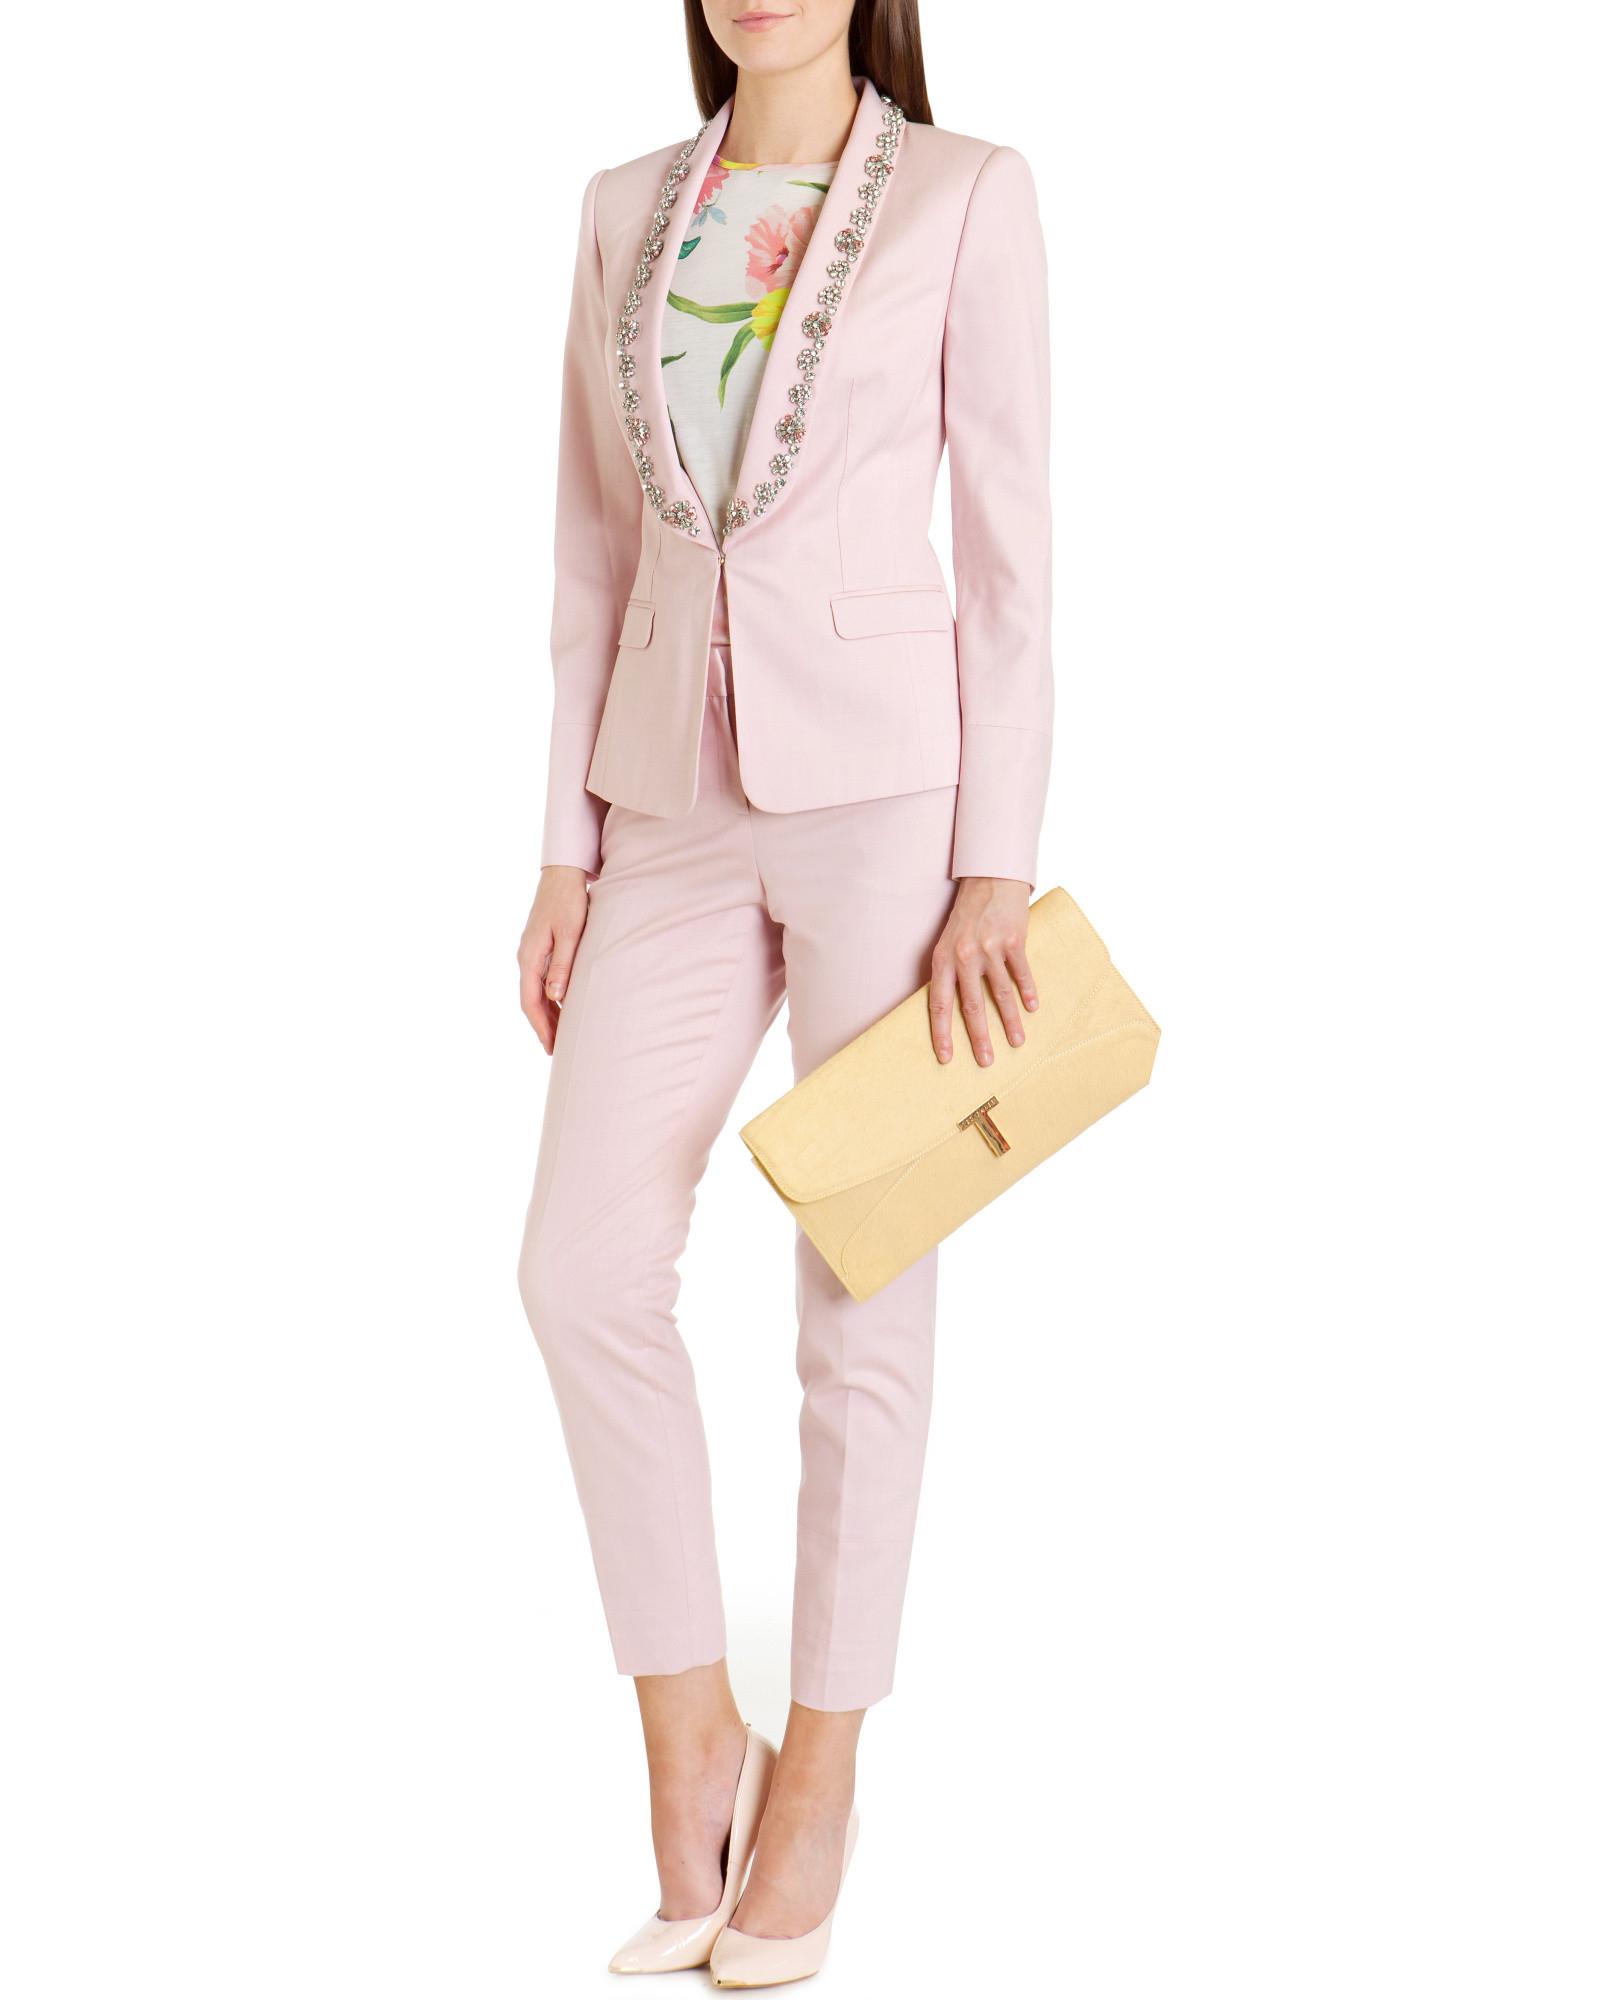 d9d32364c9abf Ted Baker Pastel Embellished Suit Jacket in Pink - Lyst